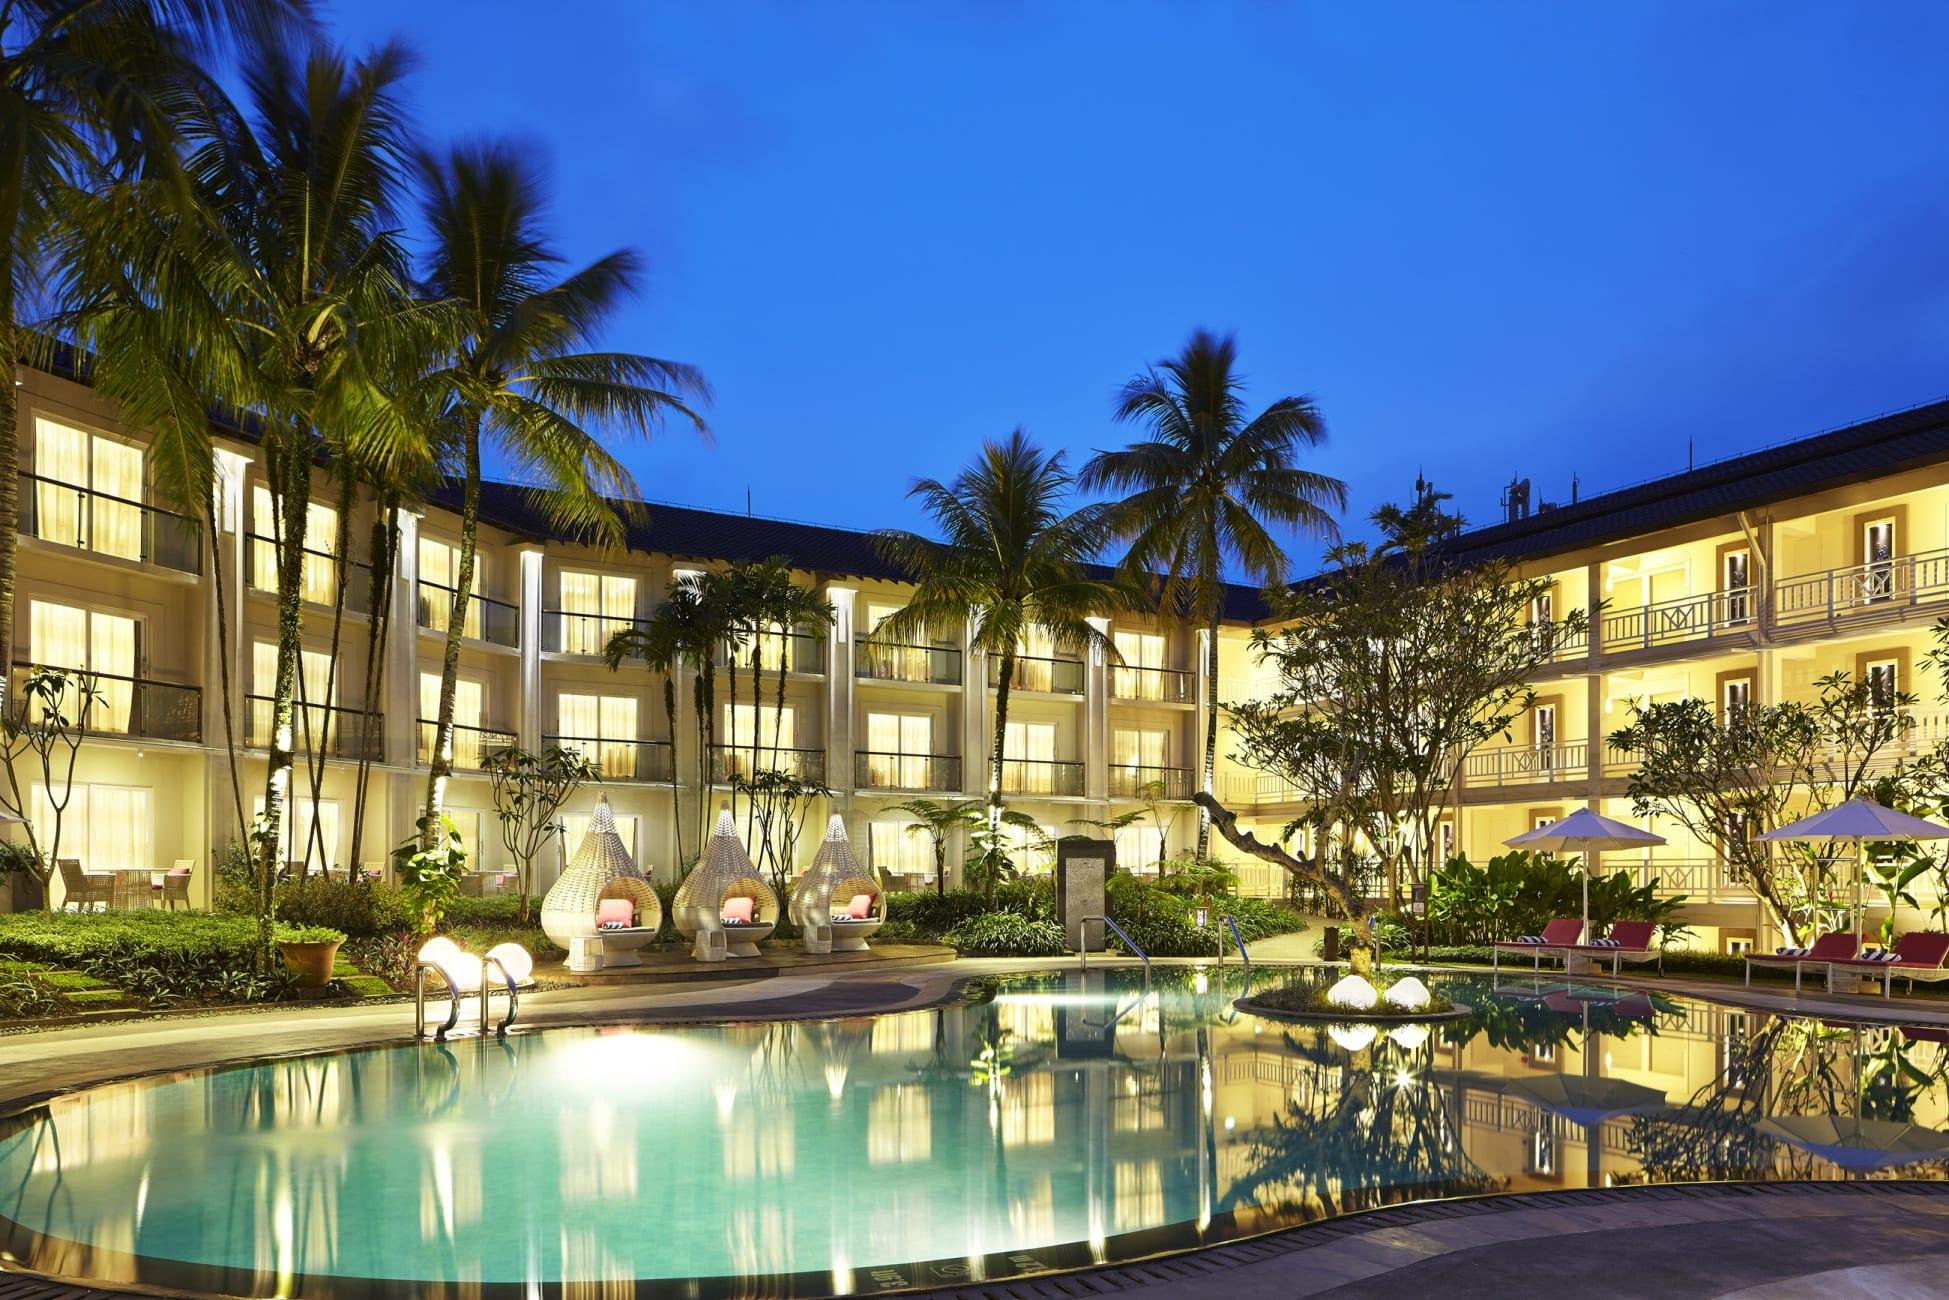 Rekomendasi Penginapan Sheraton Bandung Hotel dan Towers